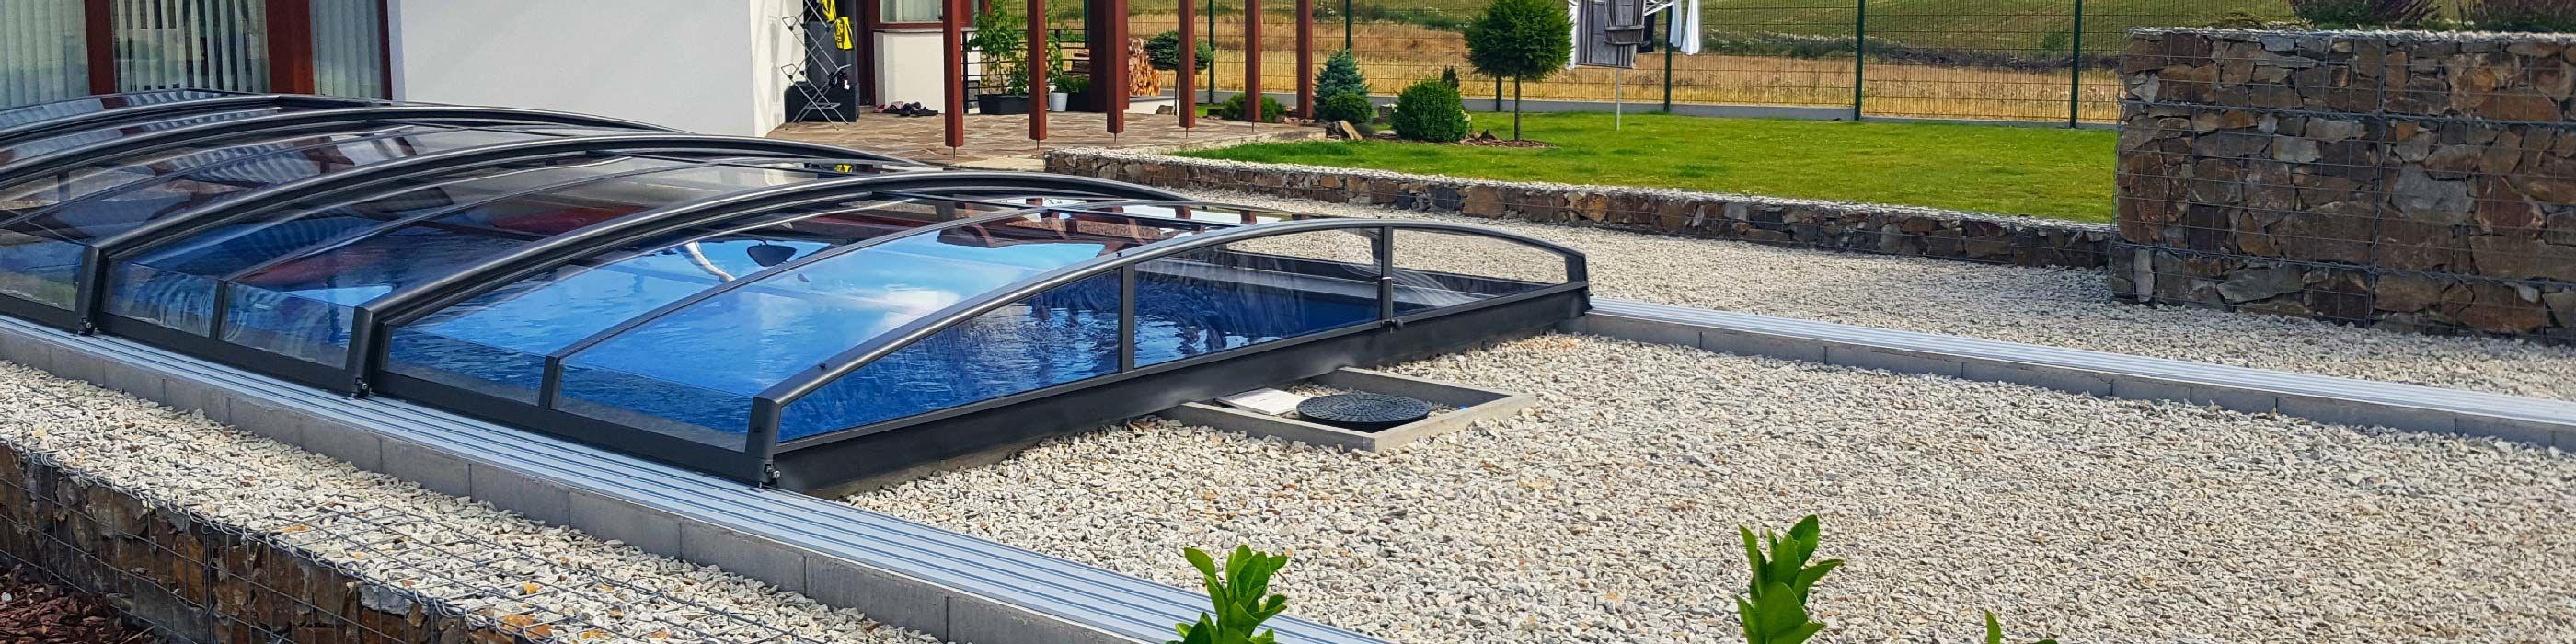 Acoperire piscina azure angle for Acoperiri piscine